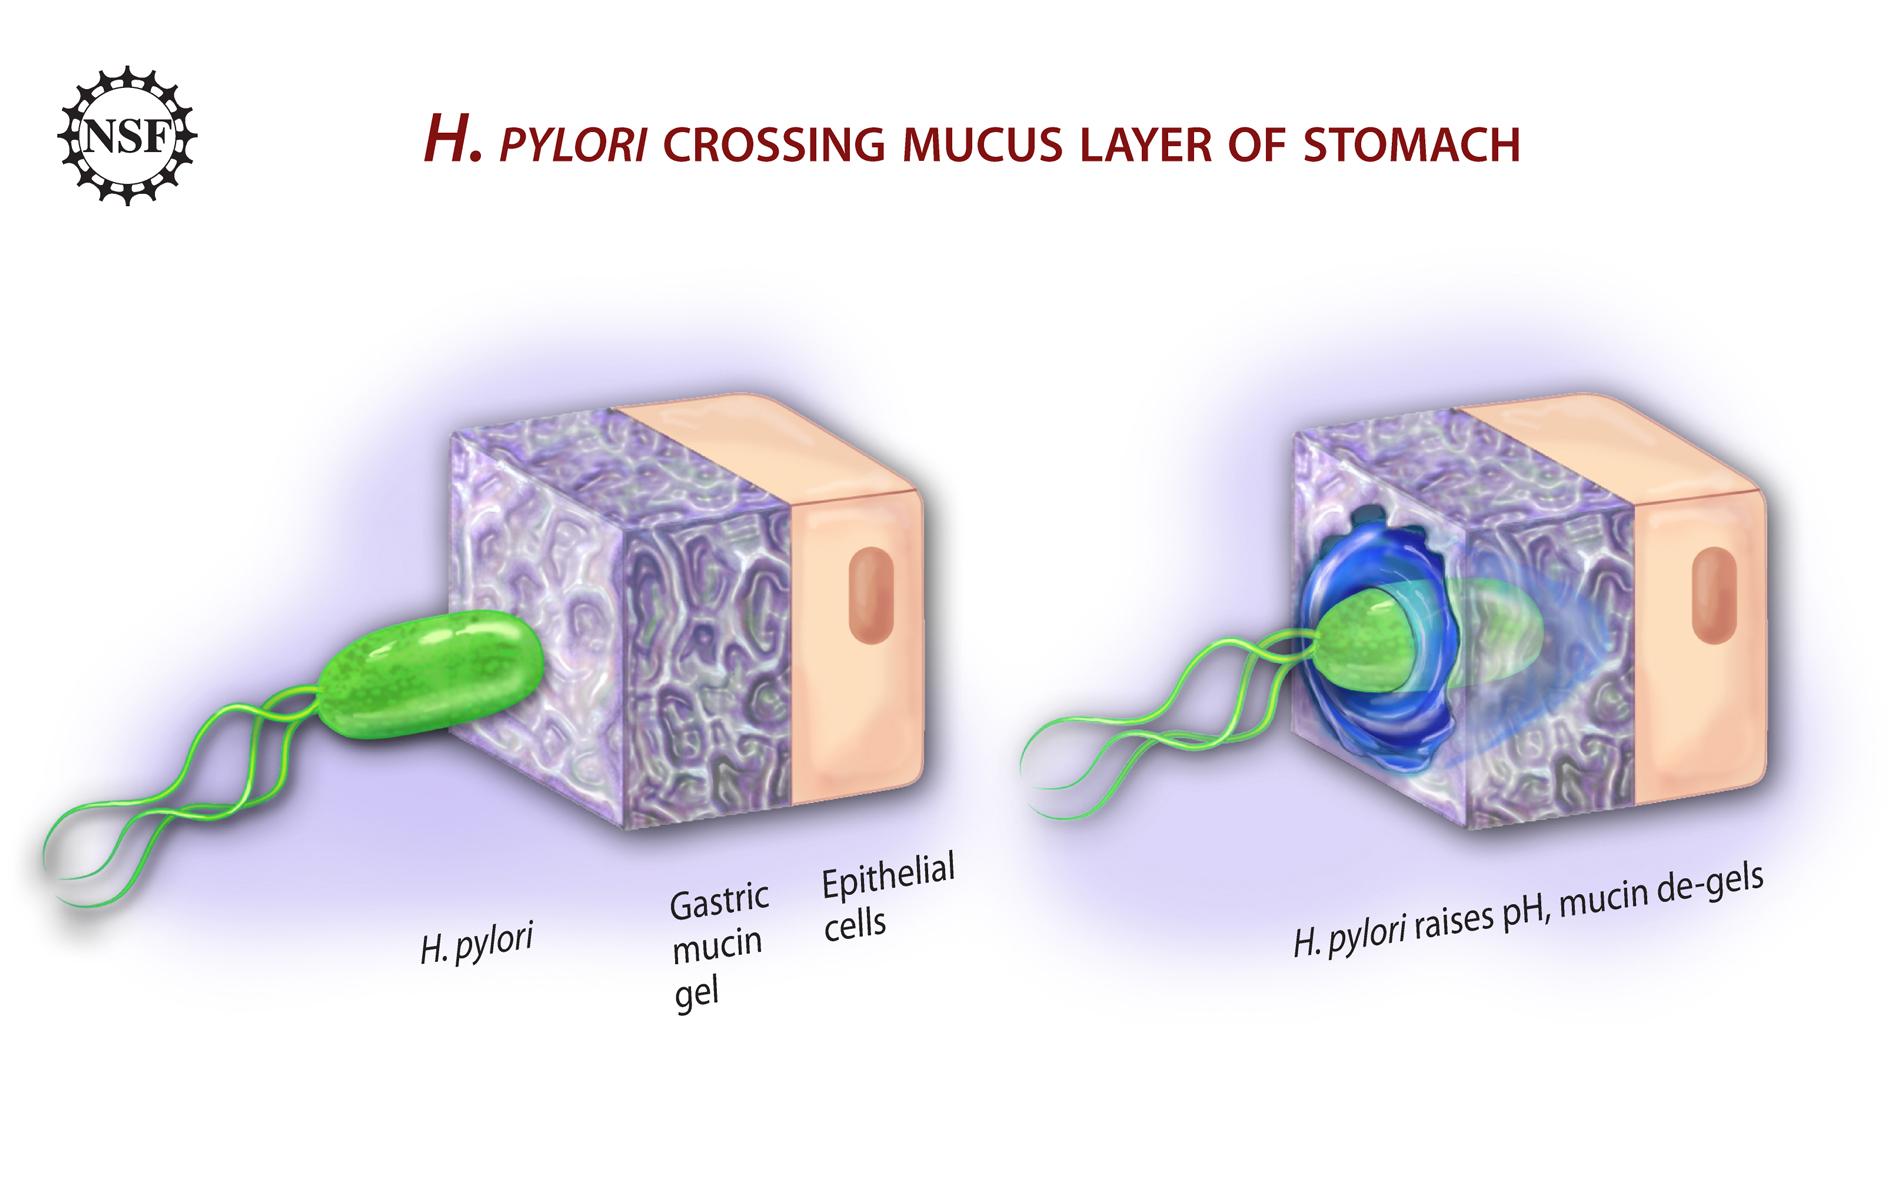 Natural Treatment For H Pylori Eradication